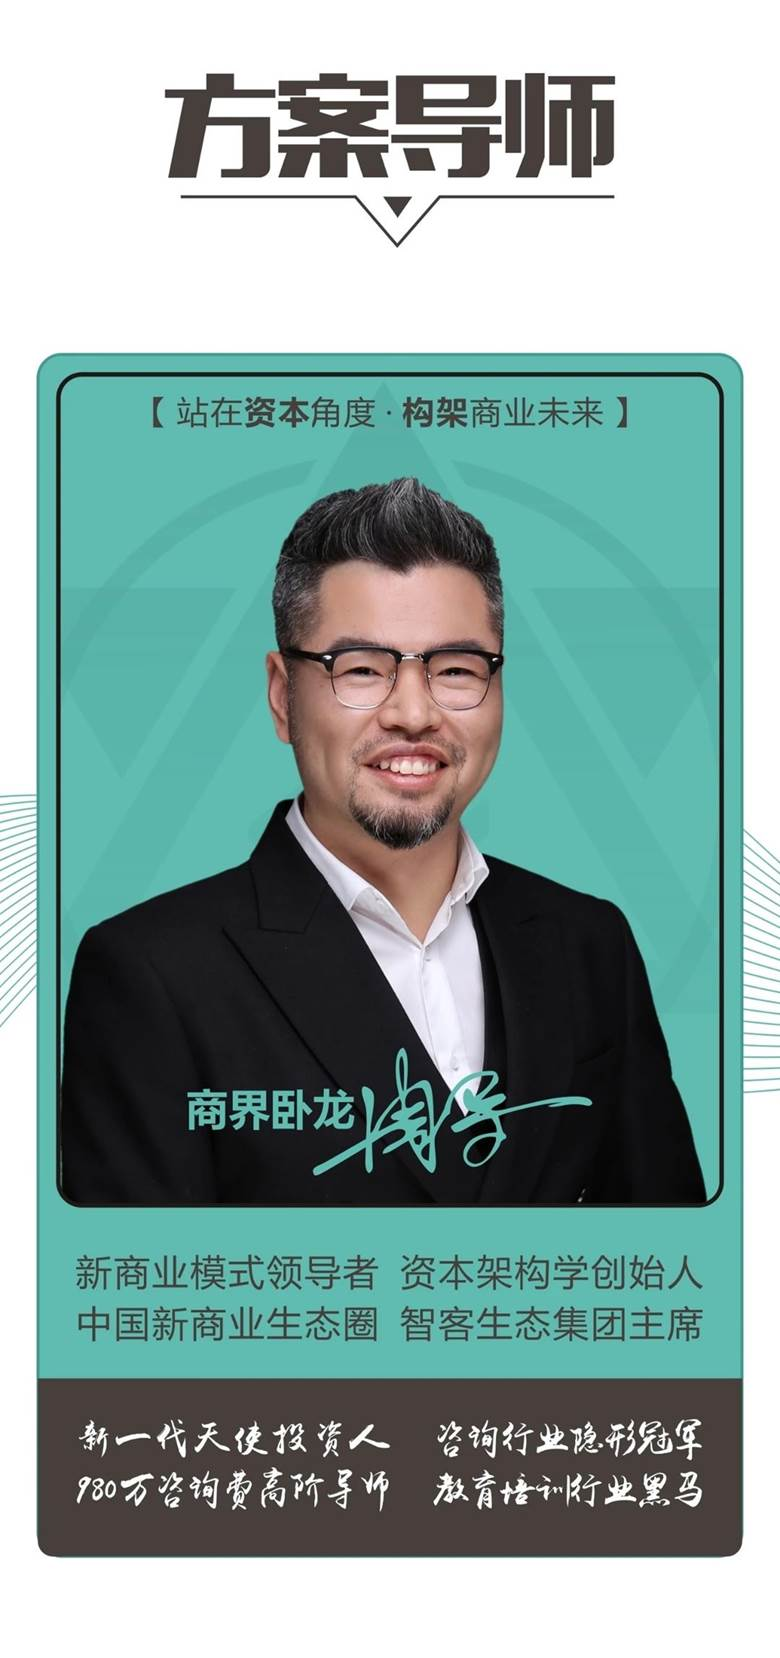 http://www.huodongxing.com/file/20191113/1063603644976/583659459097078.jpg